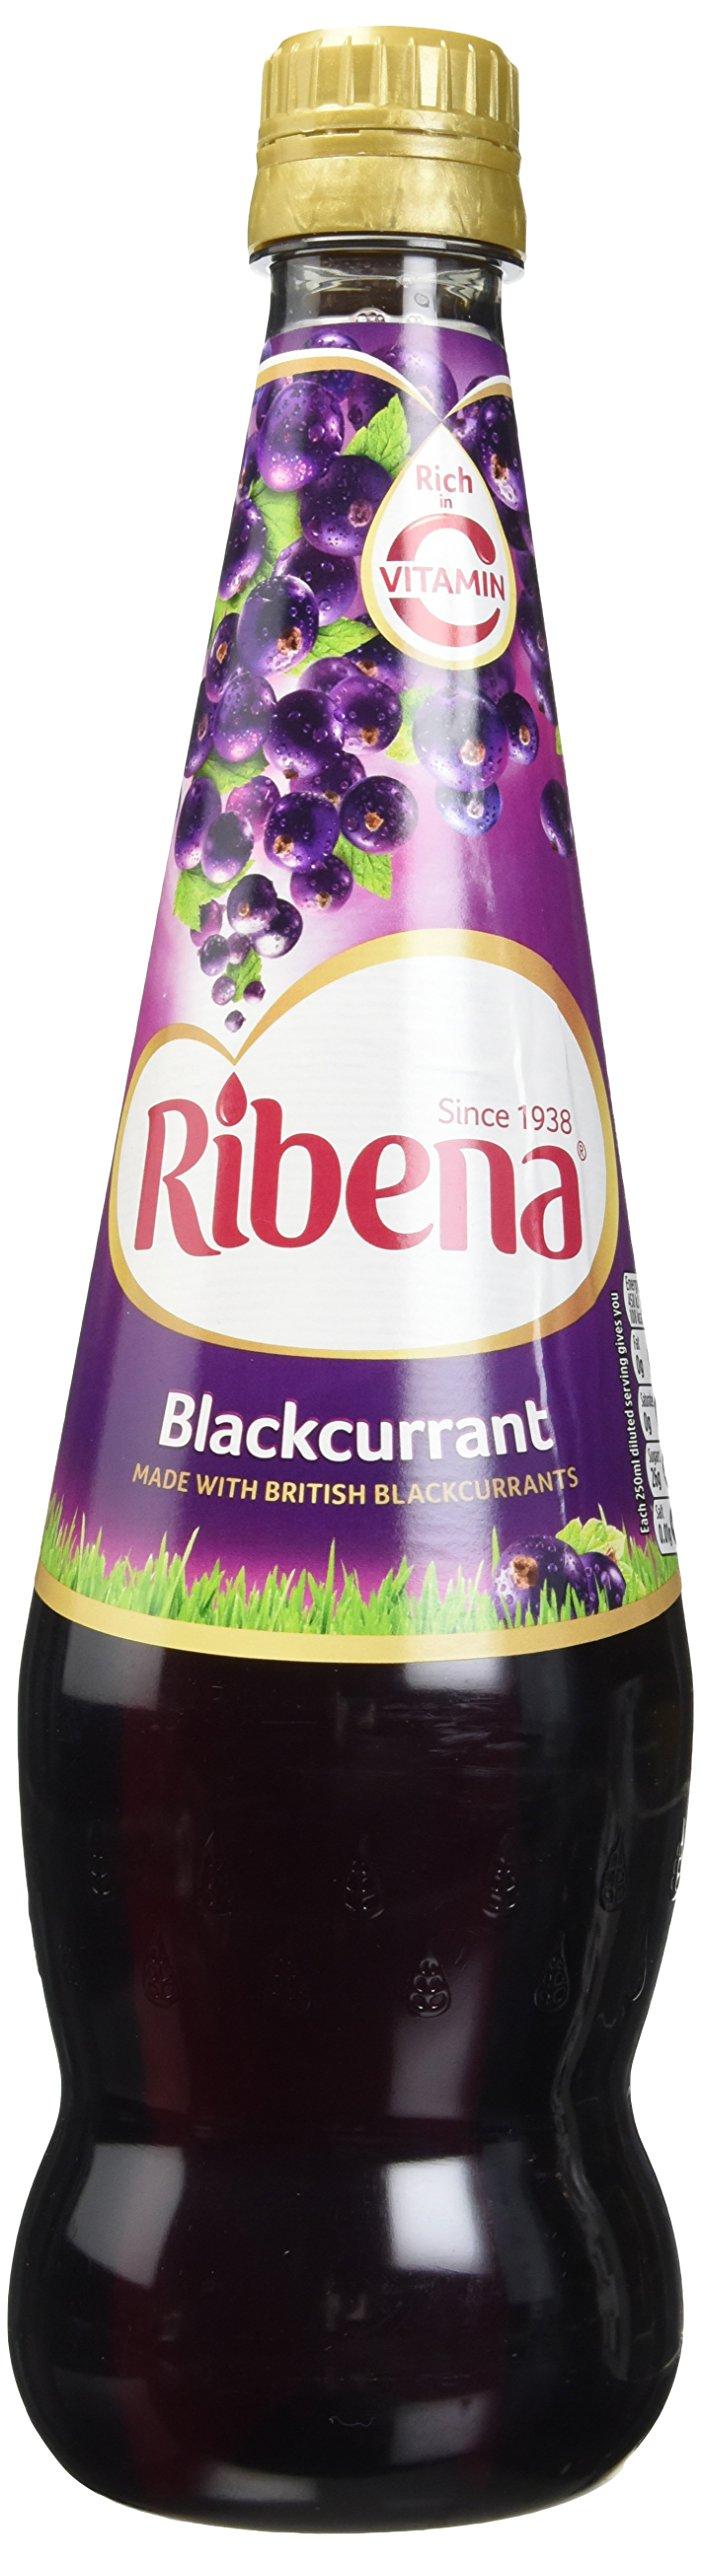 Ribena - 850ml - (2 Pack)